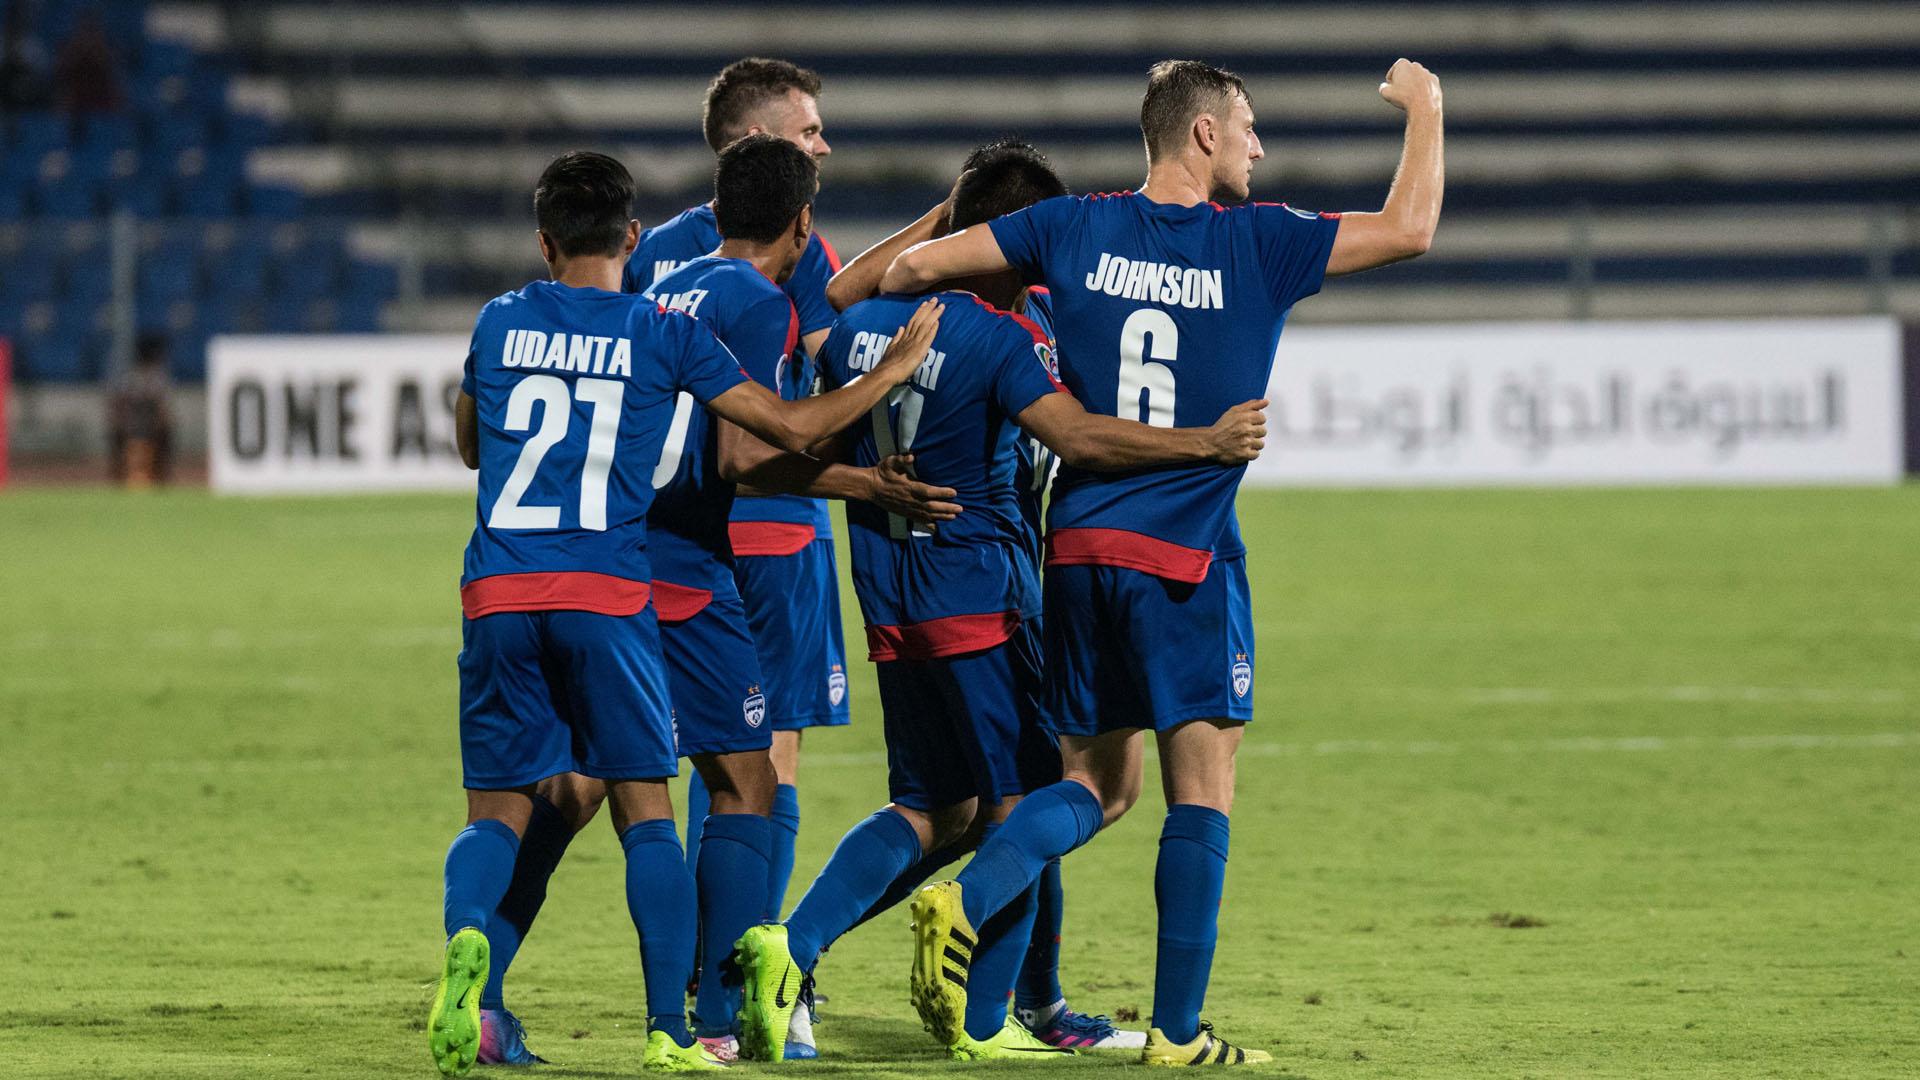 Bengaluru FC Mohun Bagan AFC Cup 2017